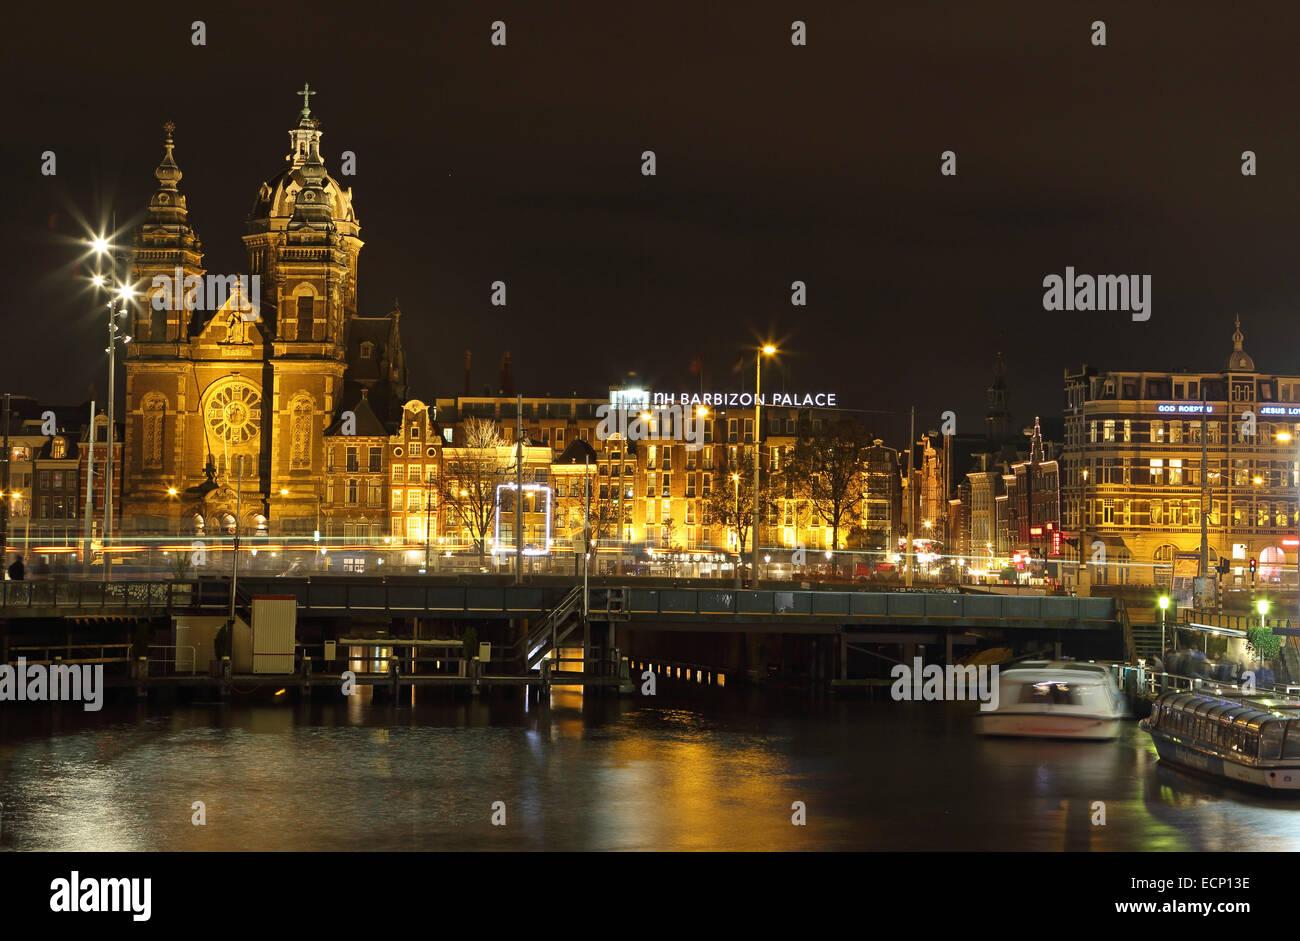 St Nicholas Hotel Amsterdam